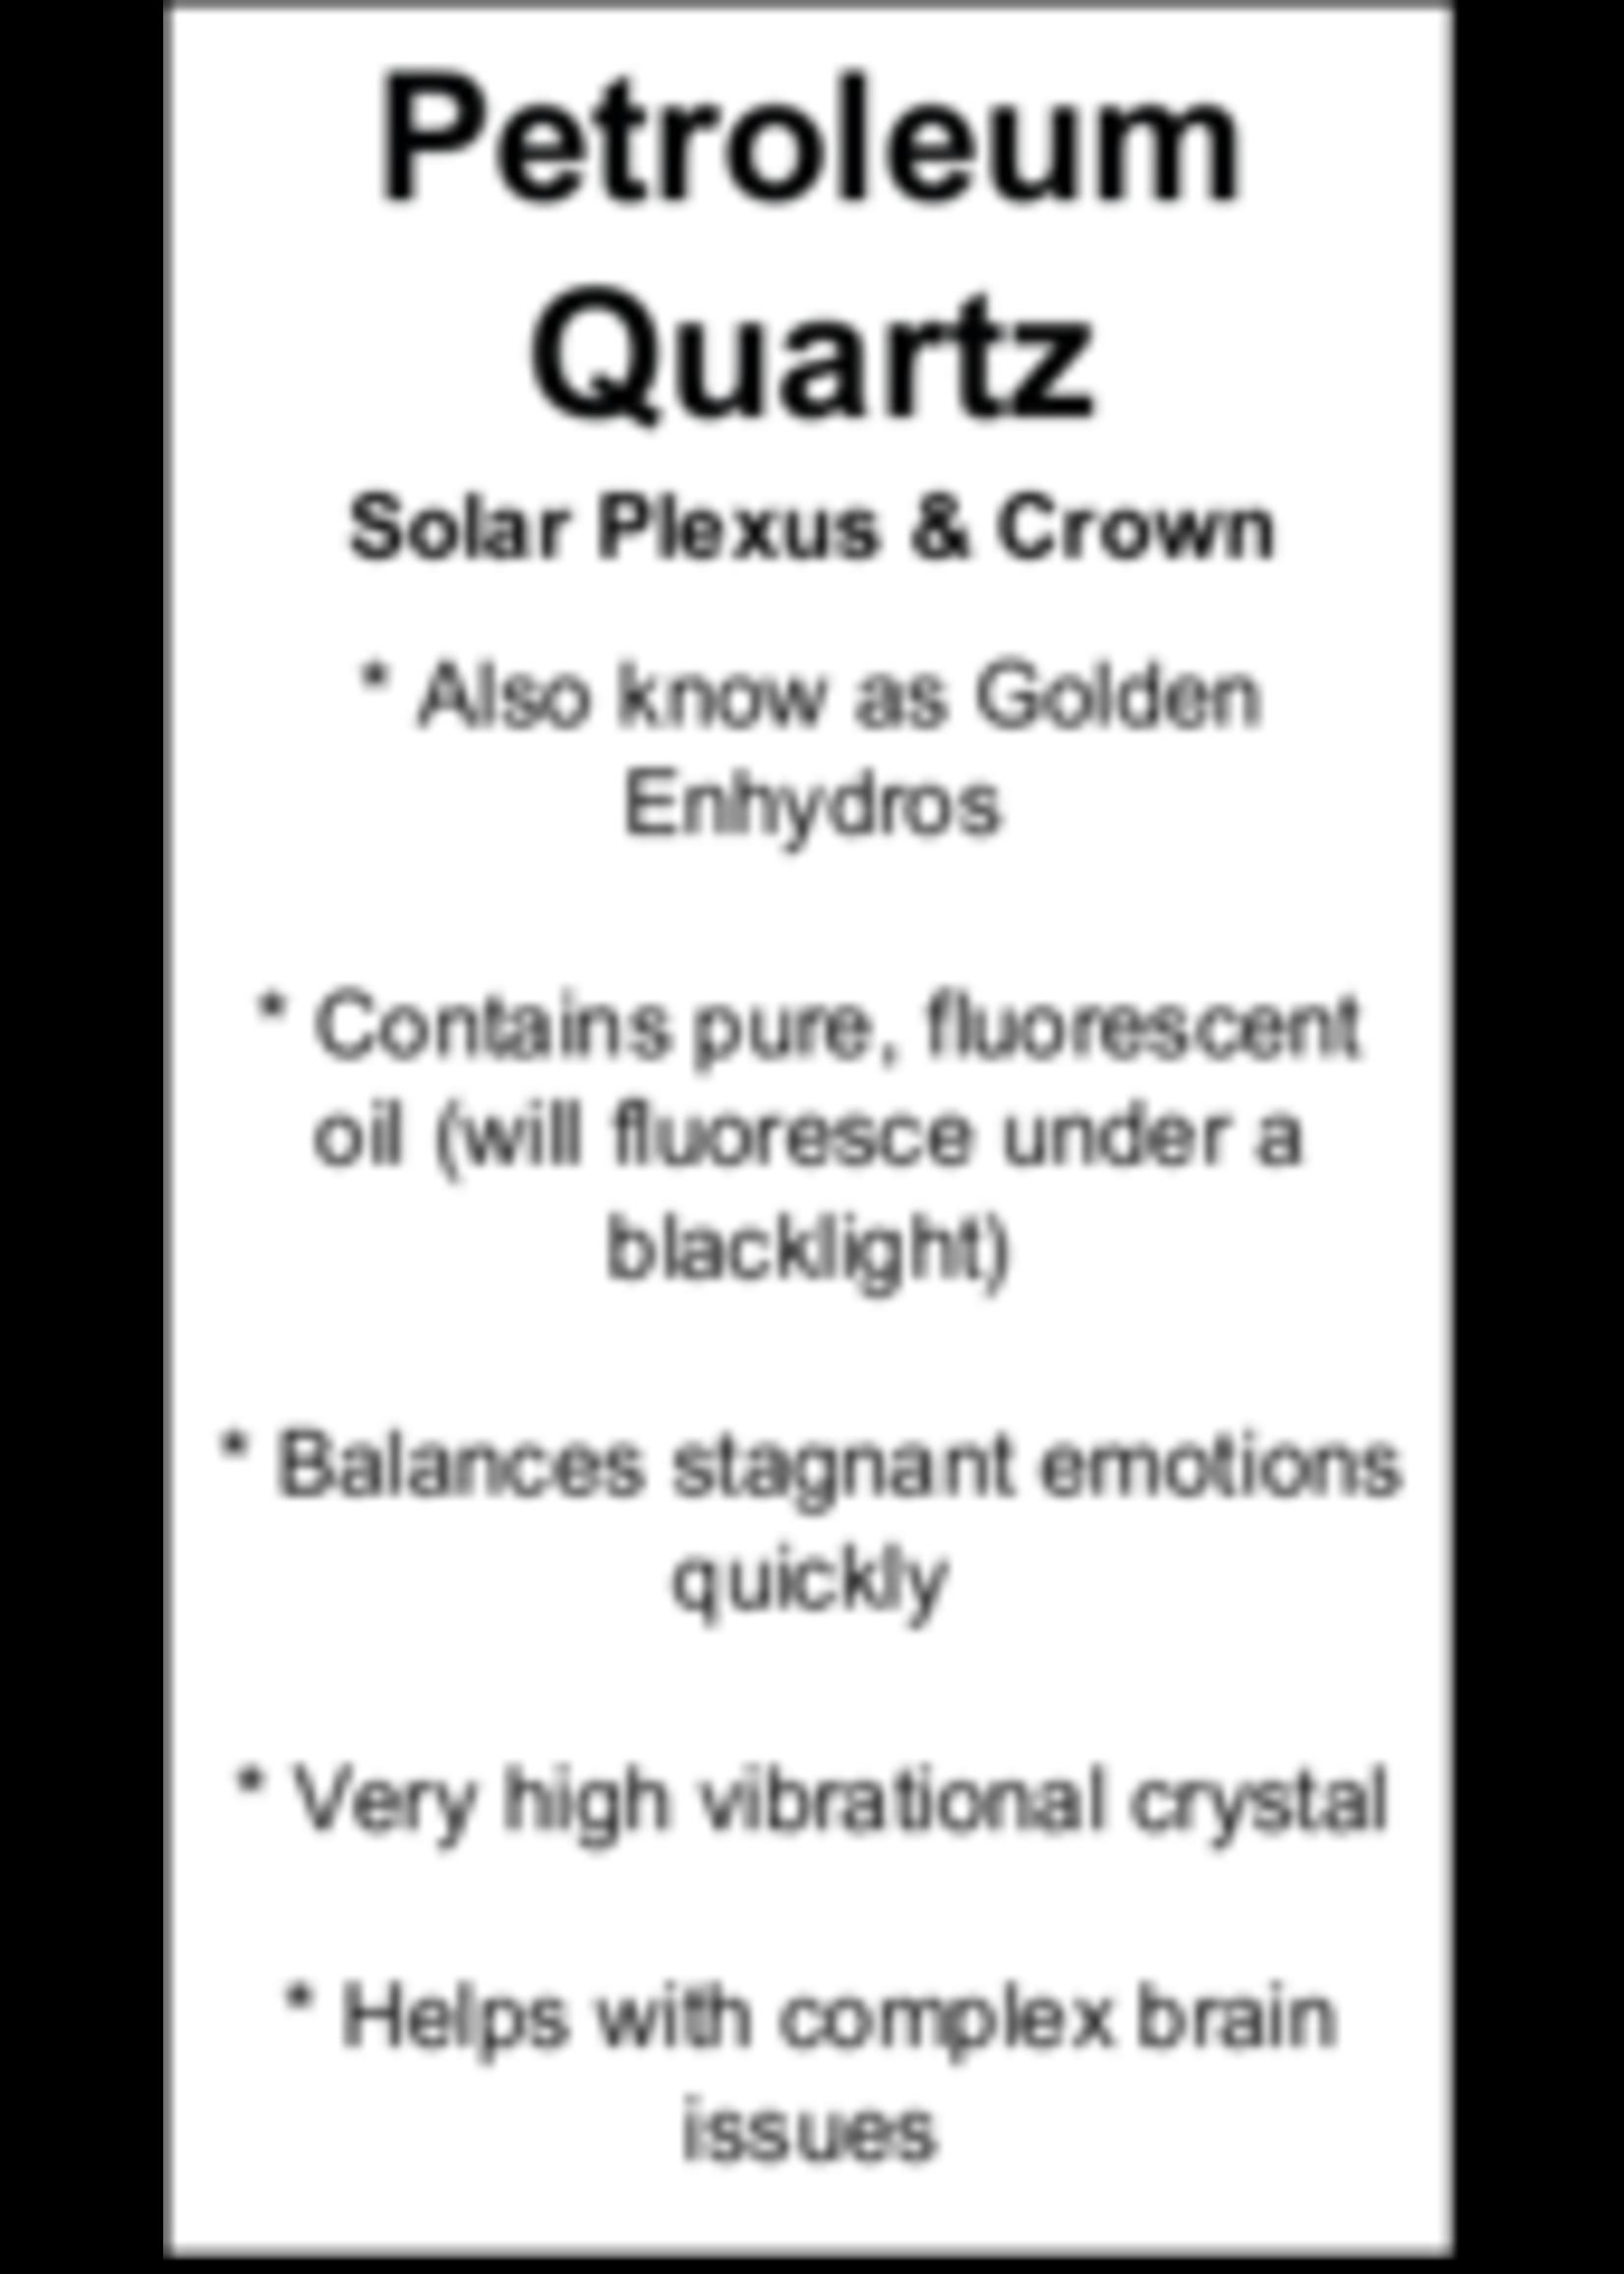 Petroleum Quartz Cards - Box of 250